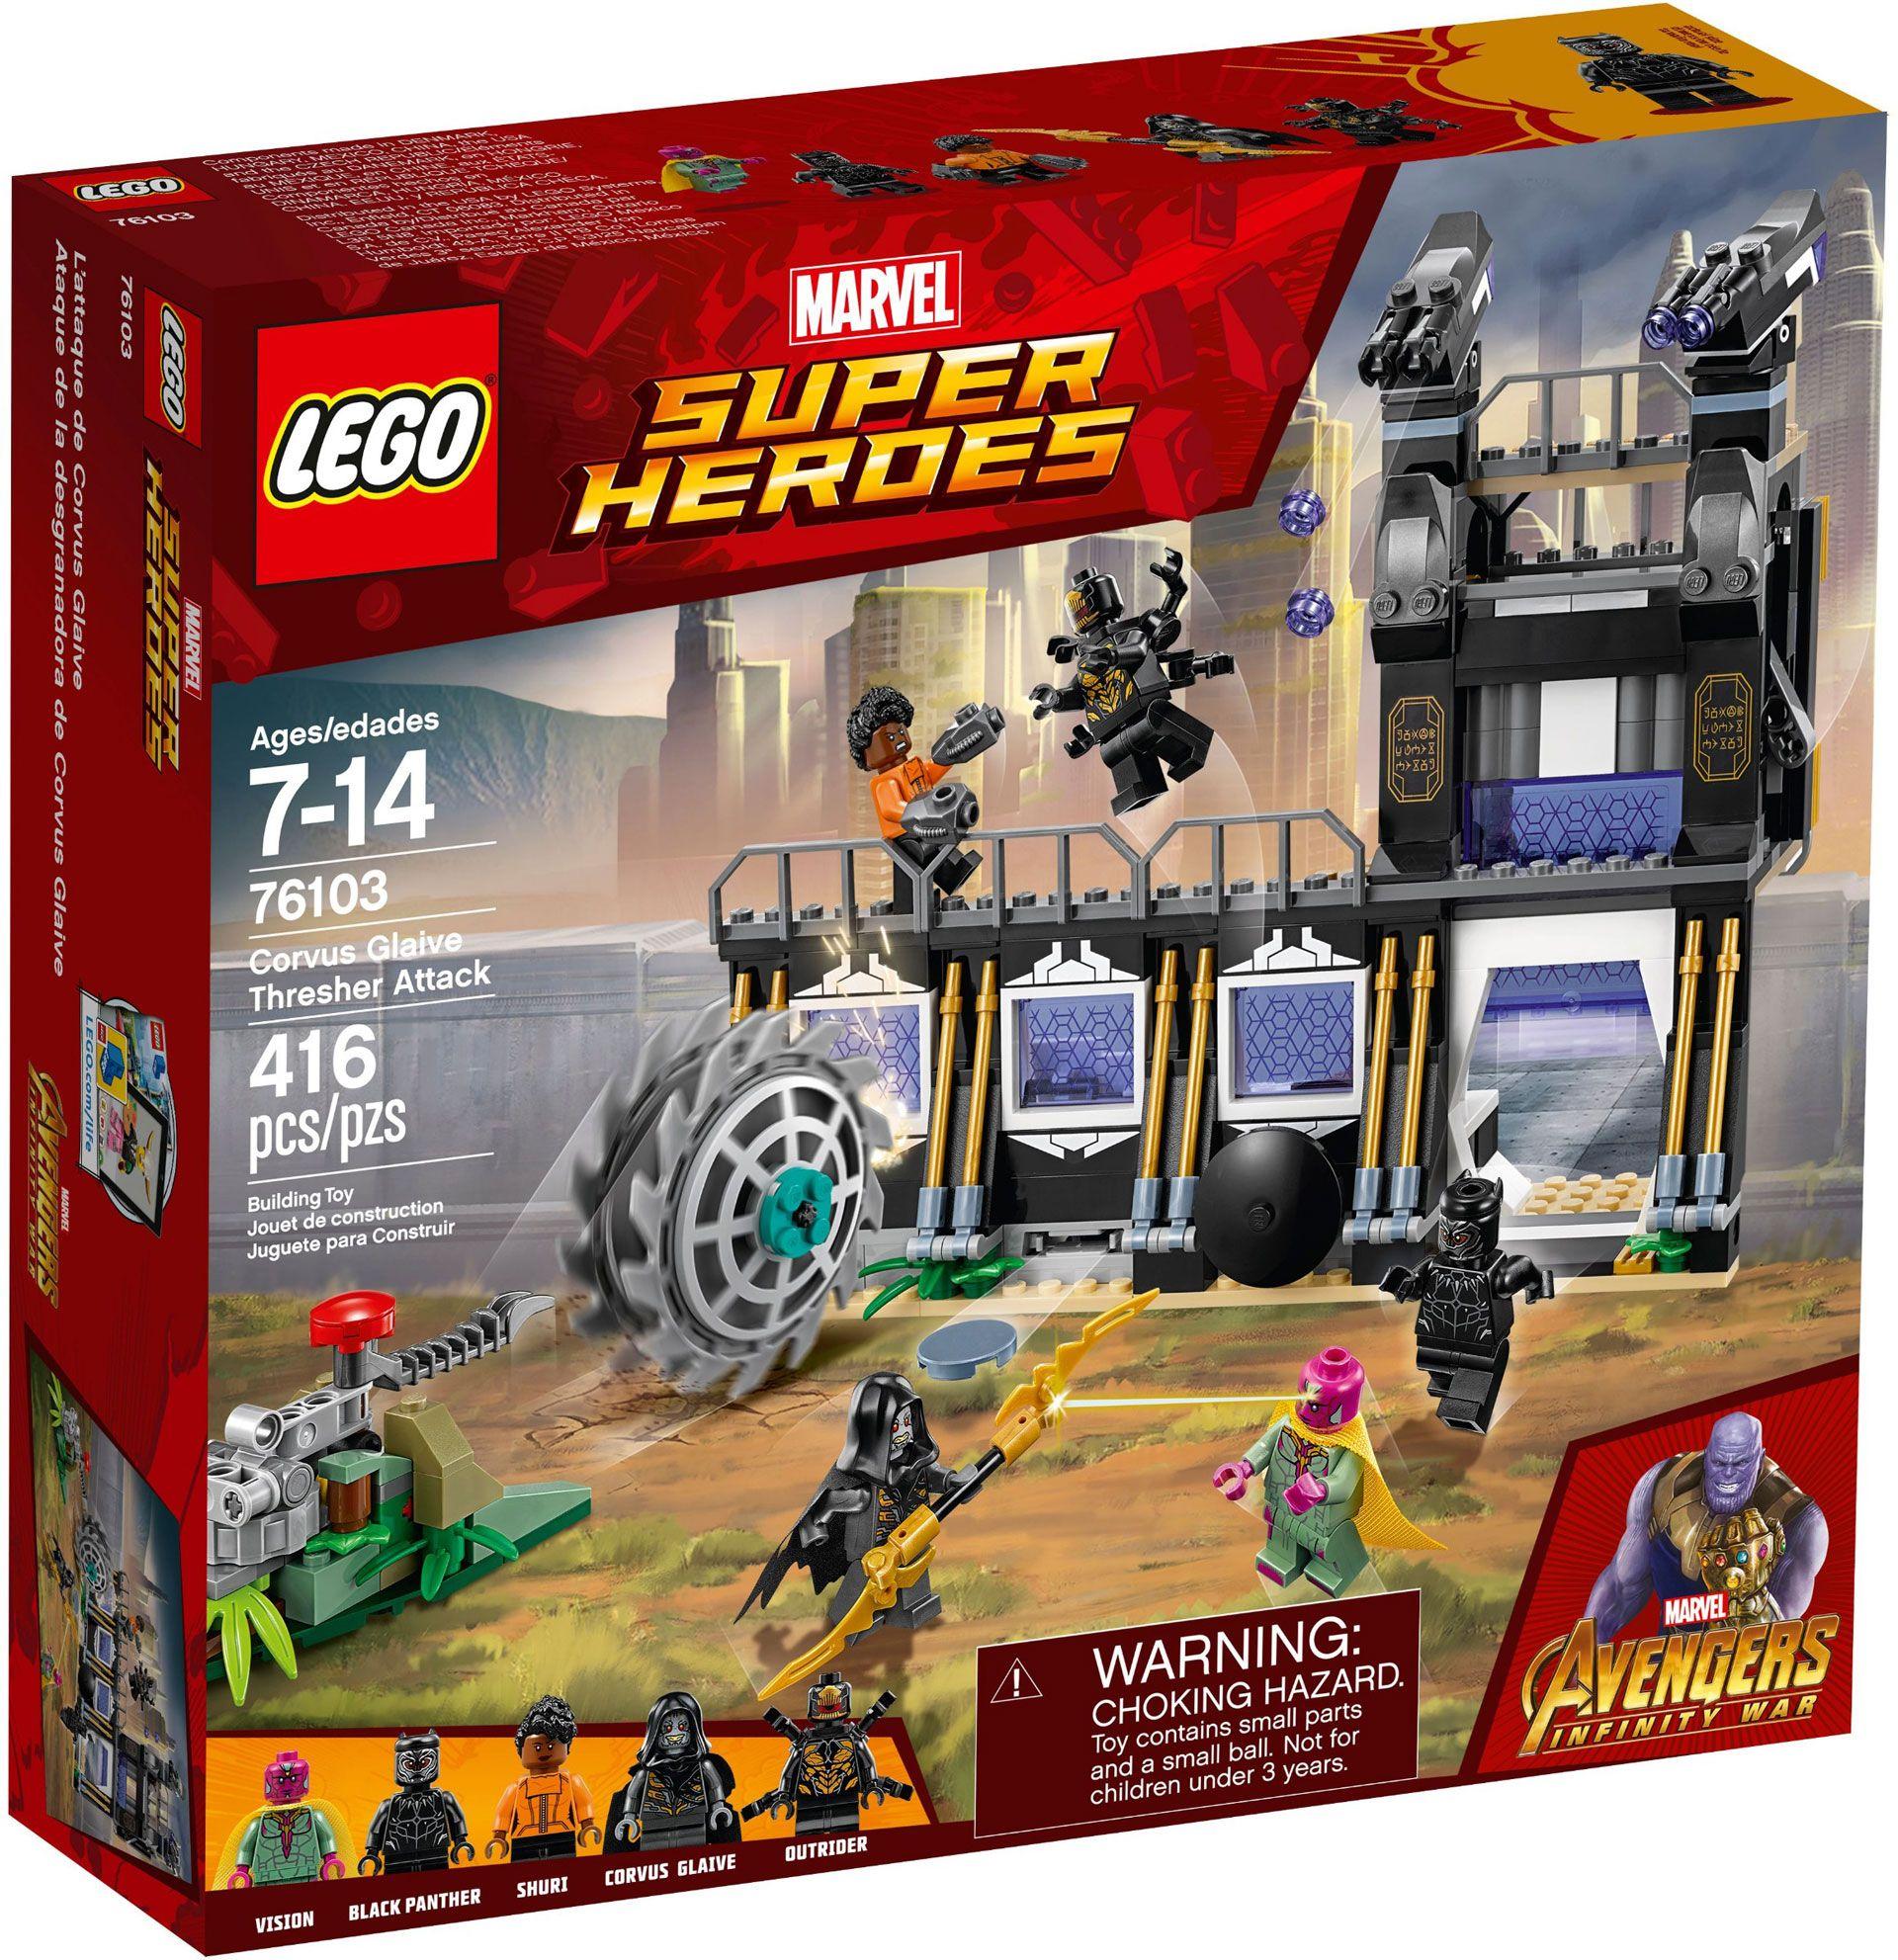 Lego Marvel Super Heroes 76103 Infinity War đại Chiến Wakandan Dc Comics Heroes Marvel